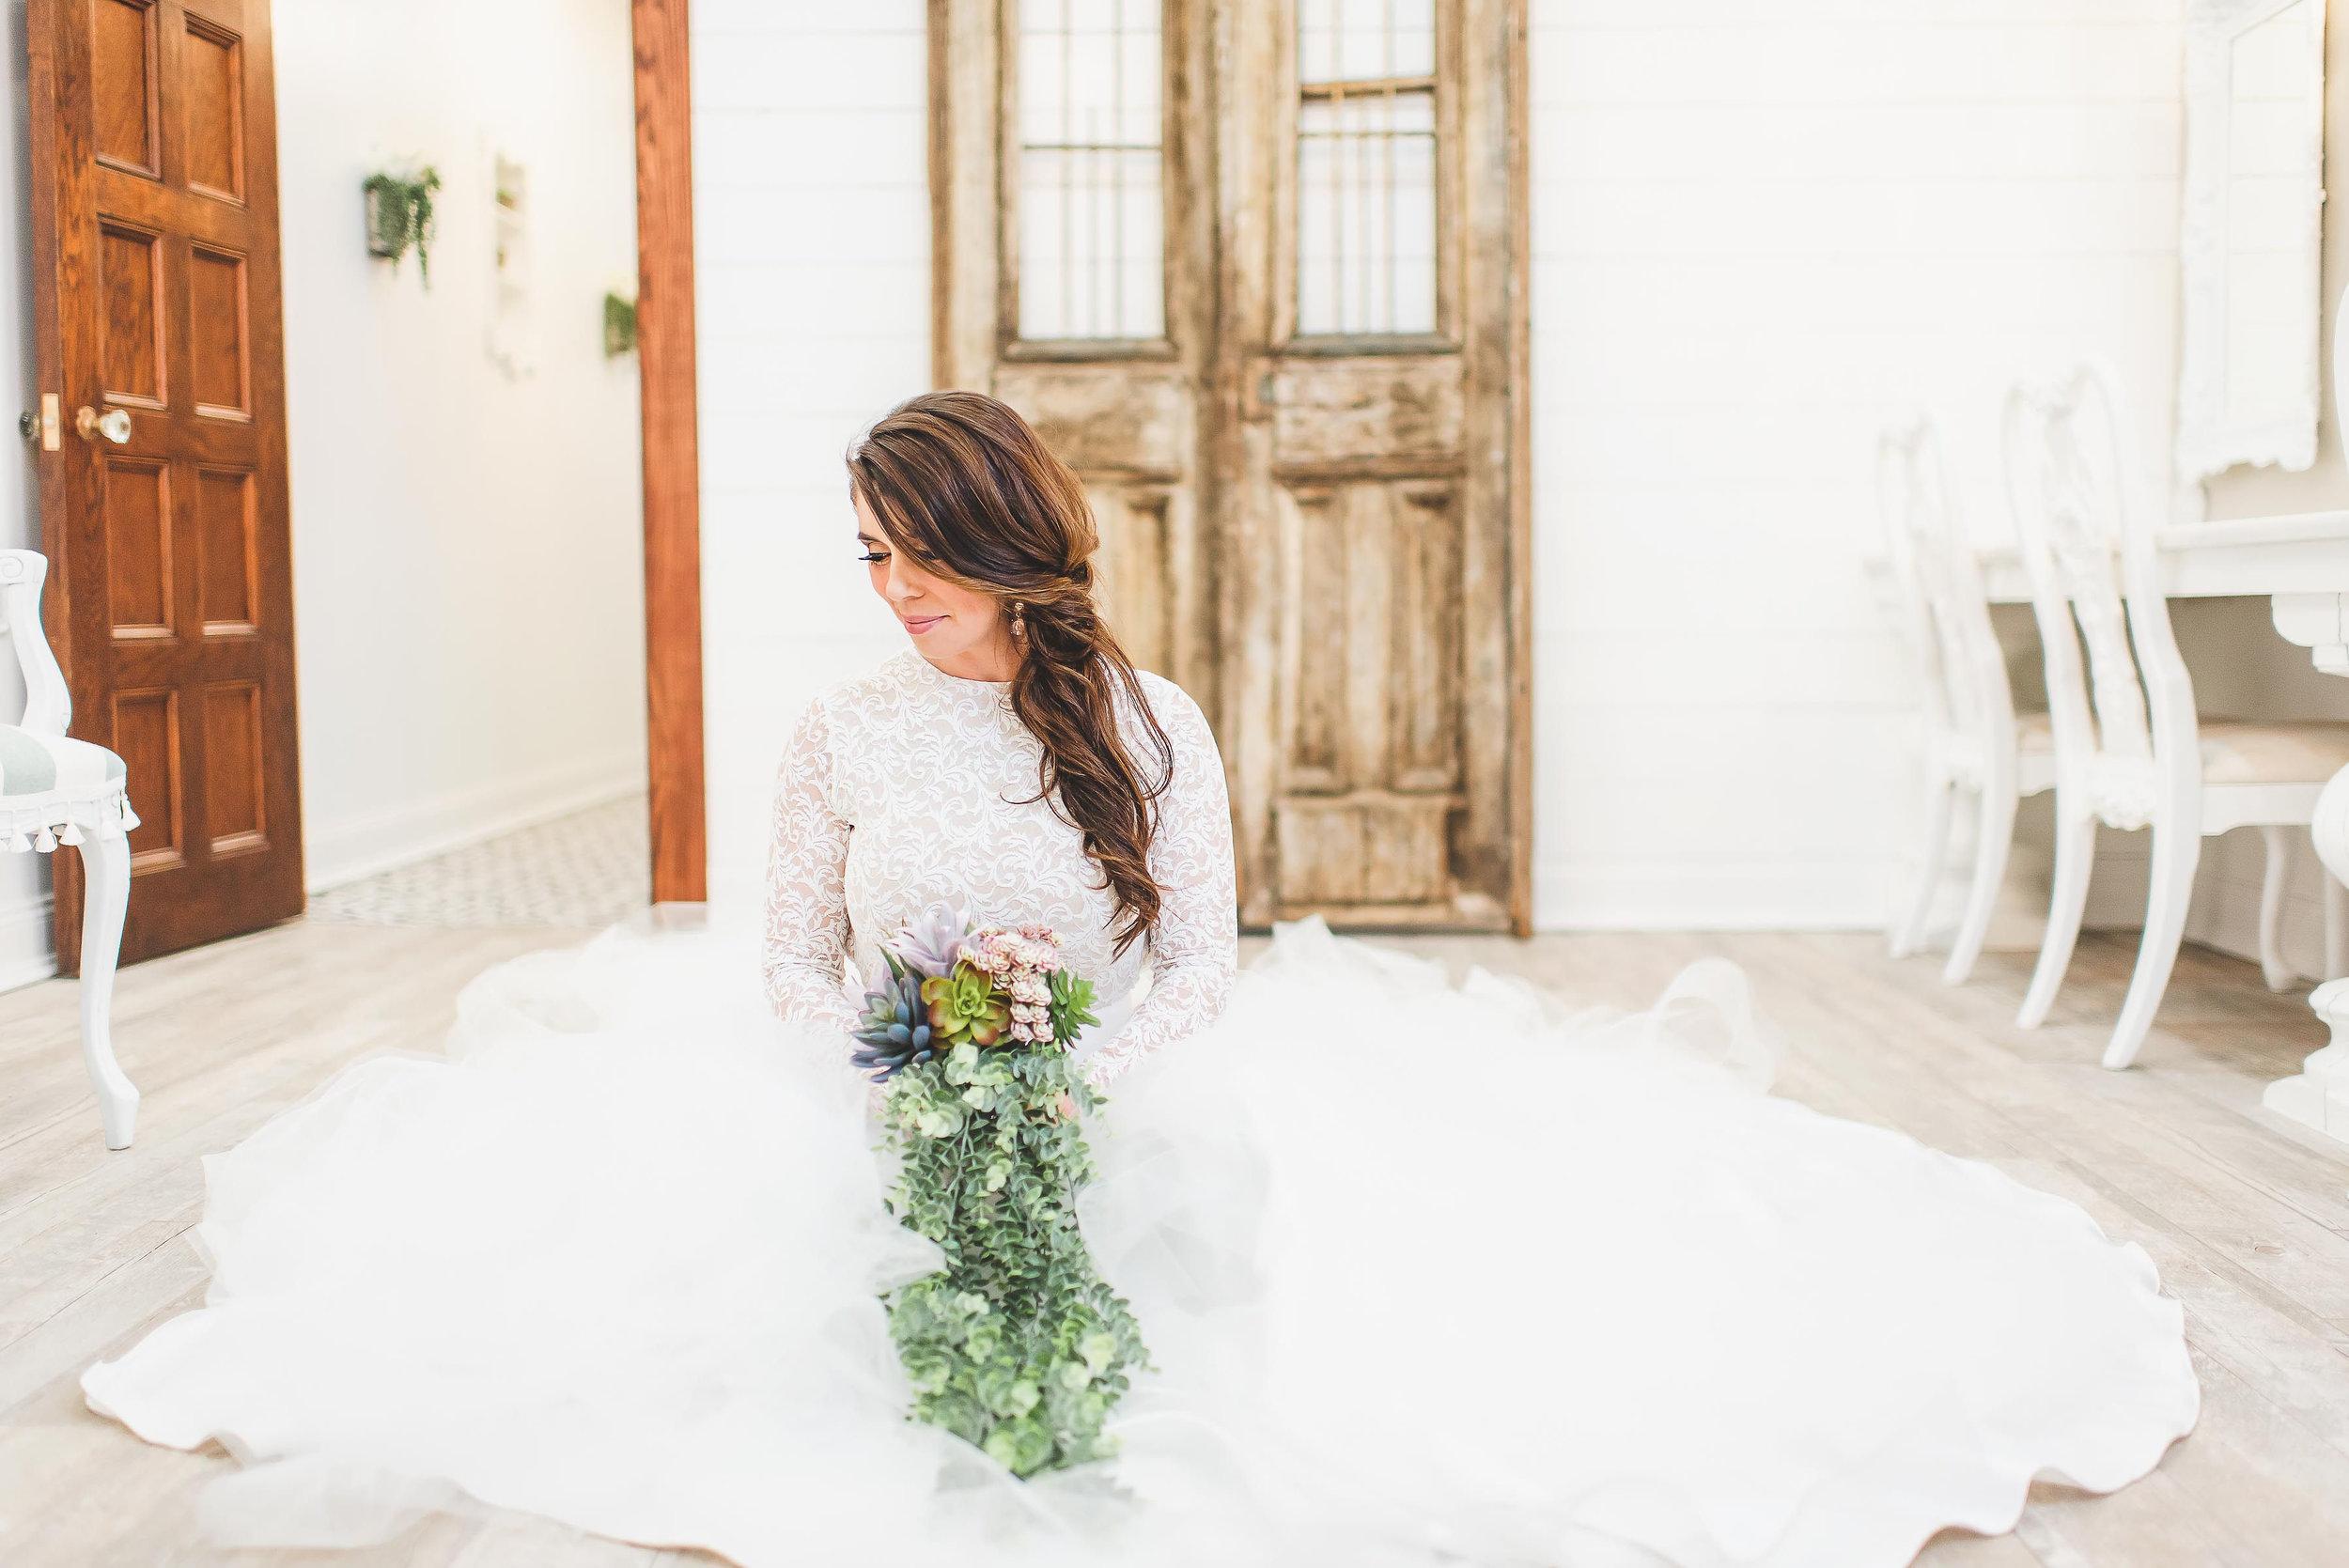 lisa seated in floor of bridal room.jpeg